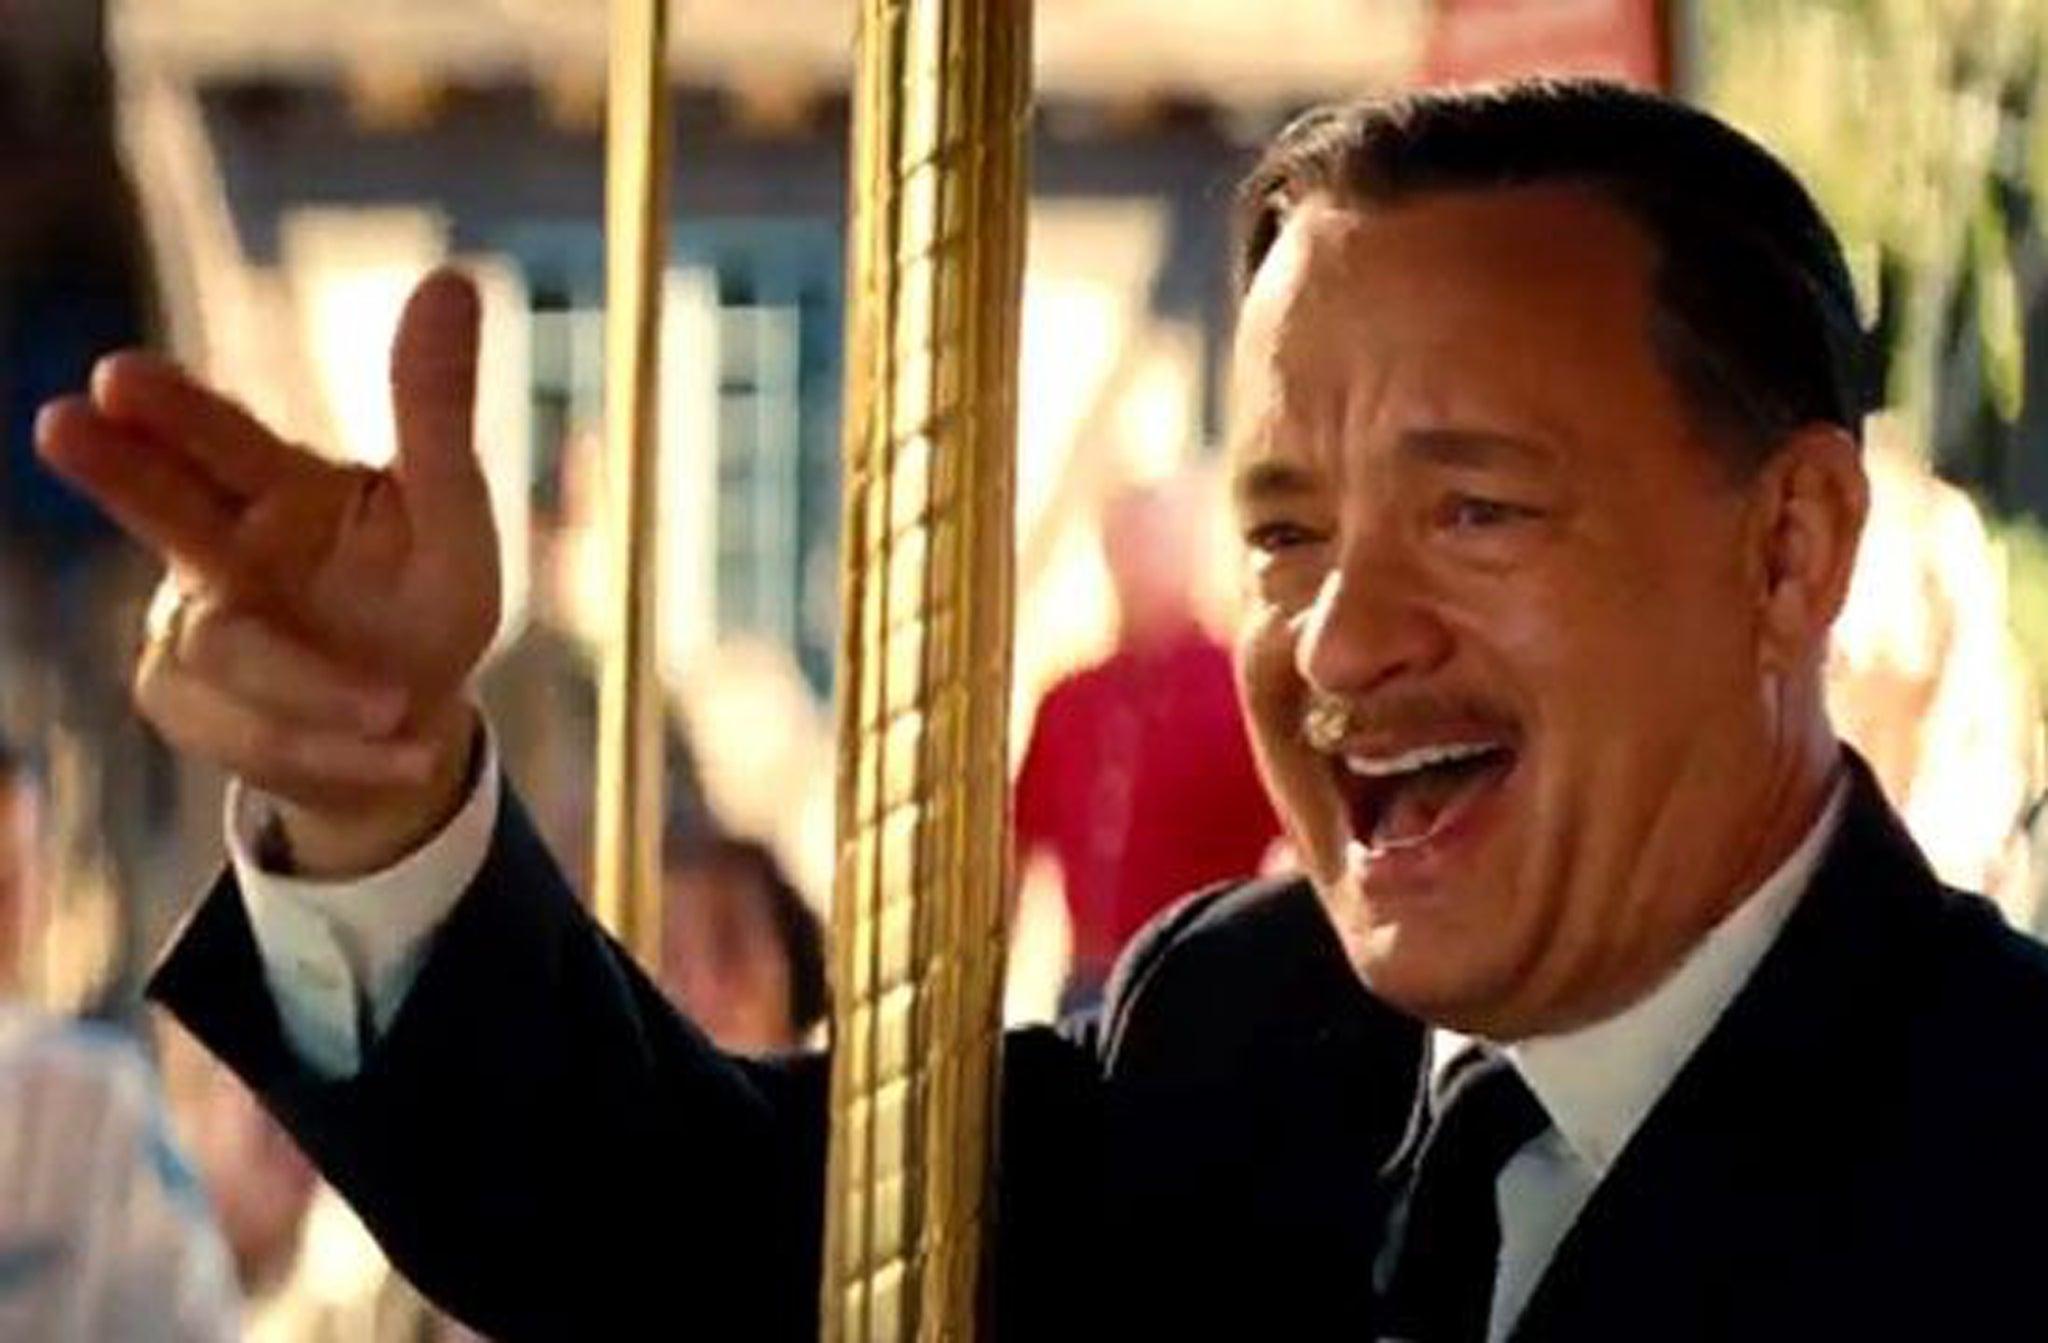 Walt Disney S Chain Smoking Habit That New Film Saving Mr Banks